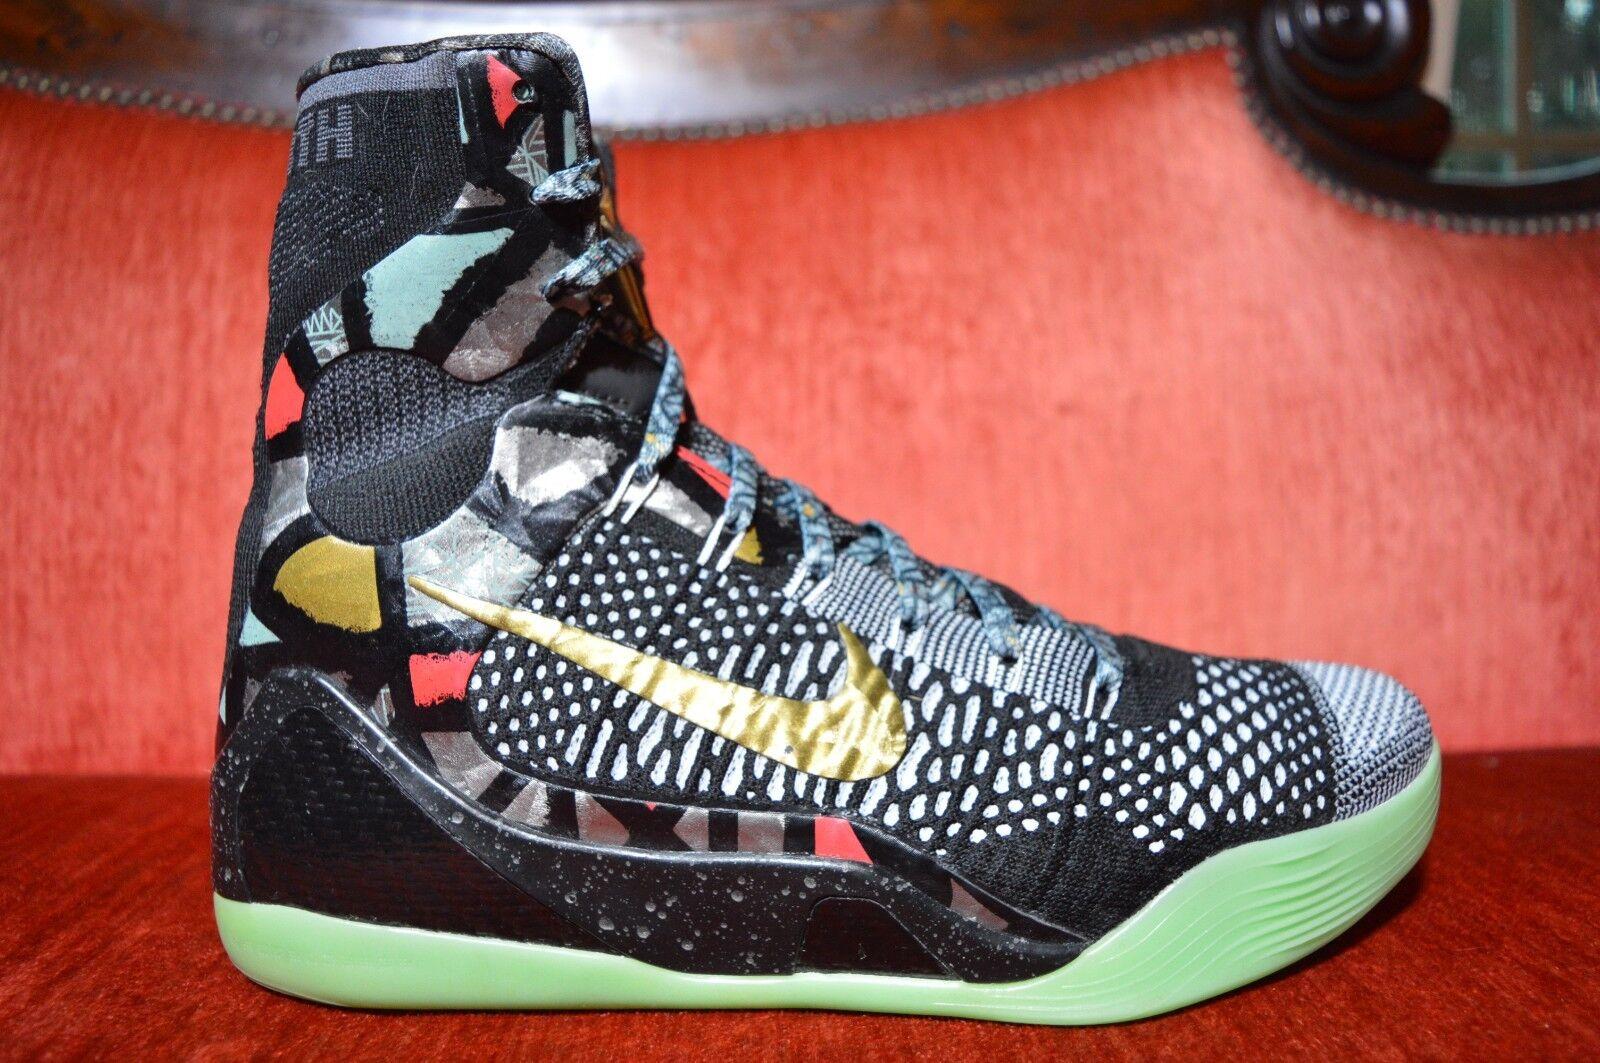 39998f517161cc CLEAN 2014 Nike KOBE 9 ELITE GUMBO LEAGUE 630847 002 002 002 Size 10.5 All  Star. Nike Men s Air Jordan Retro ...